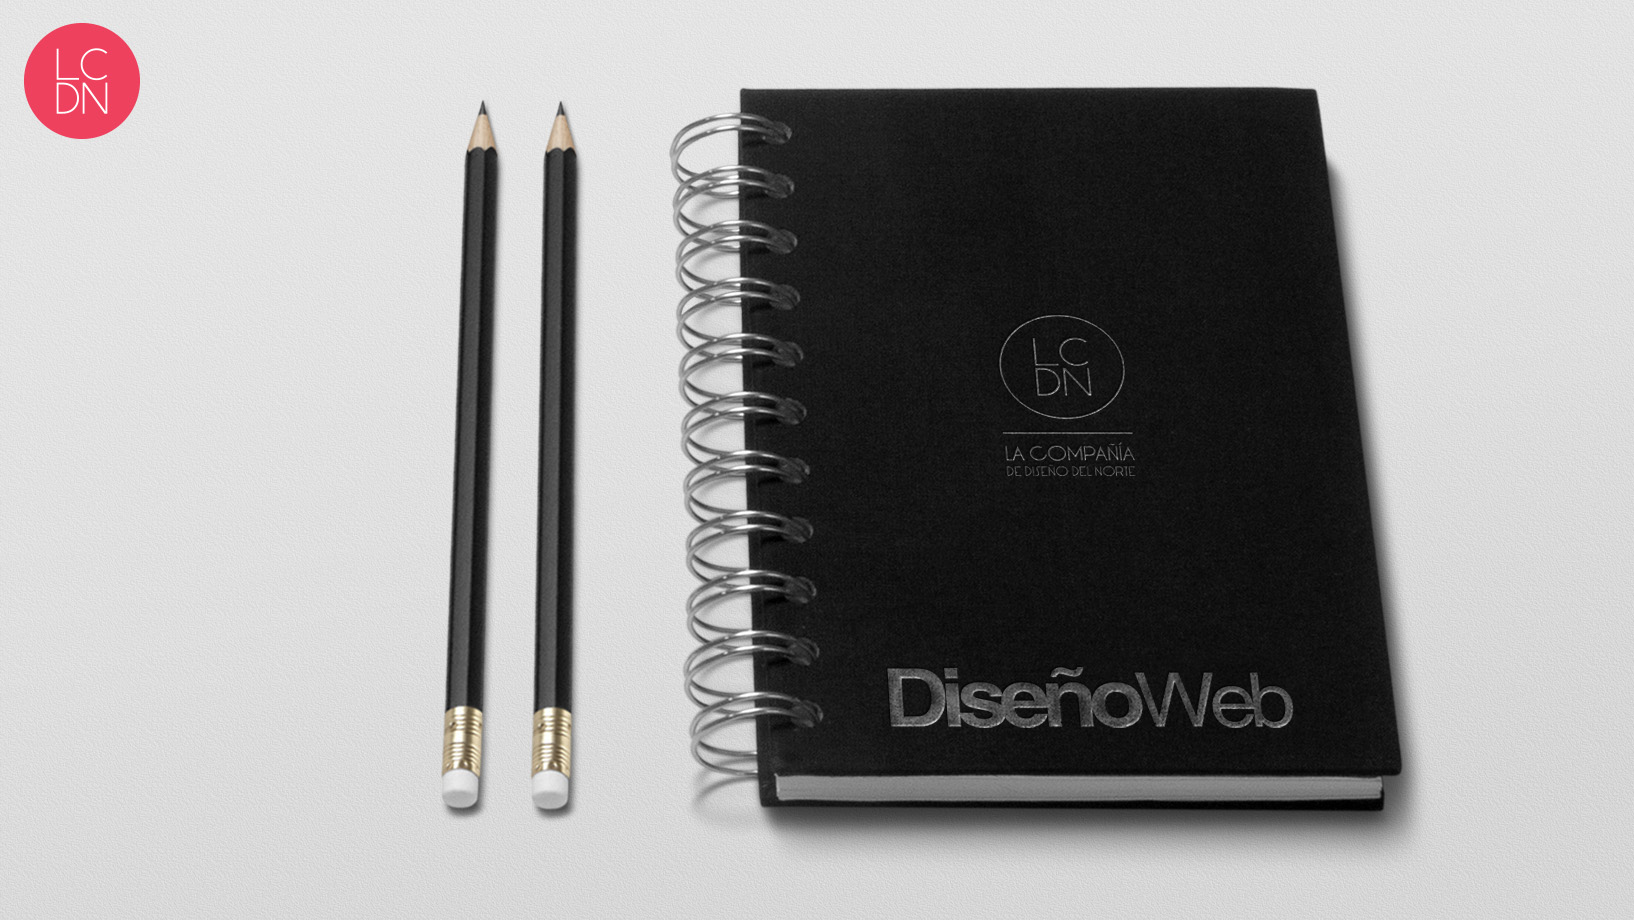 Block_Diseño_WEB_LCDN